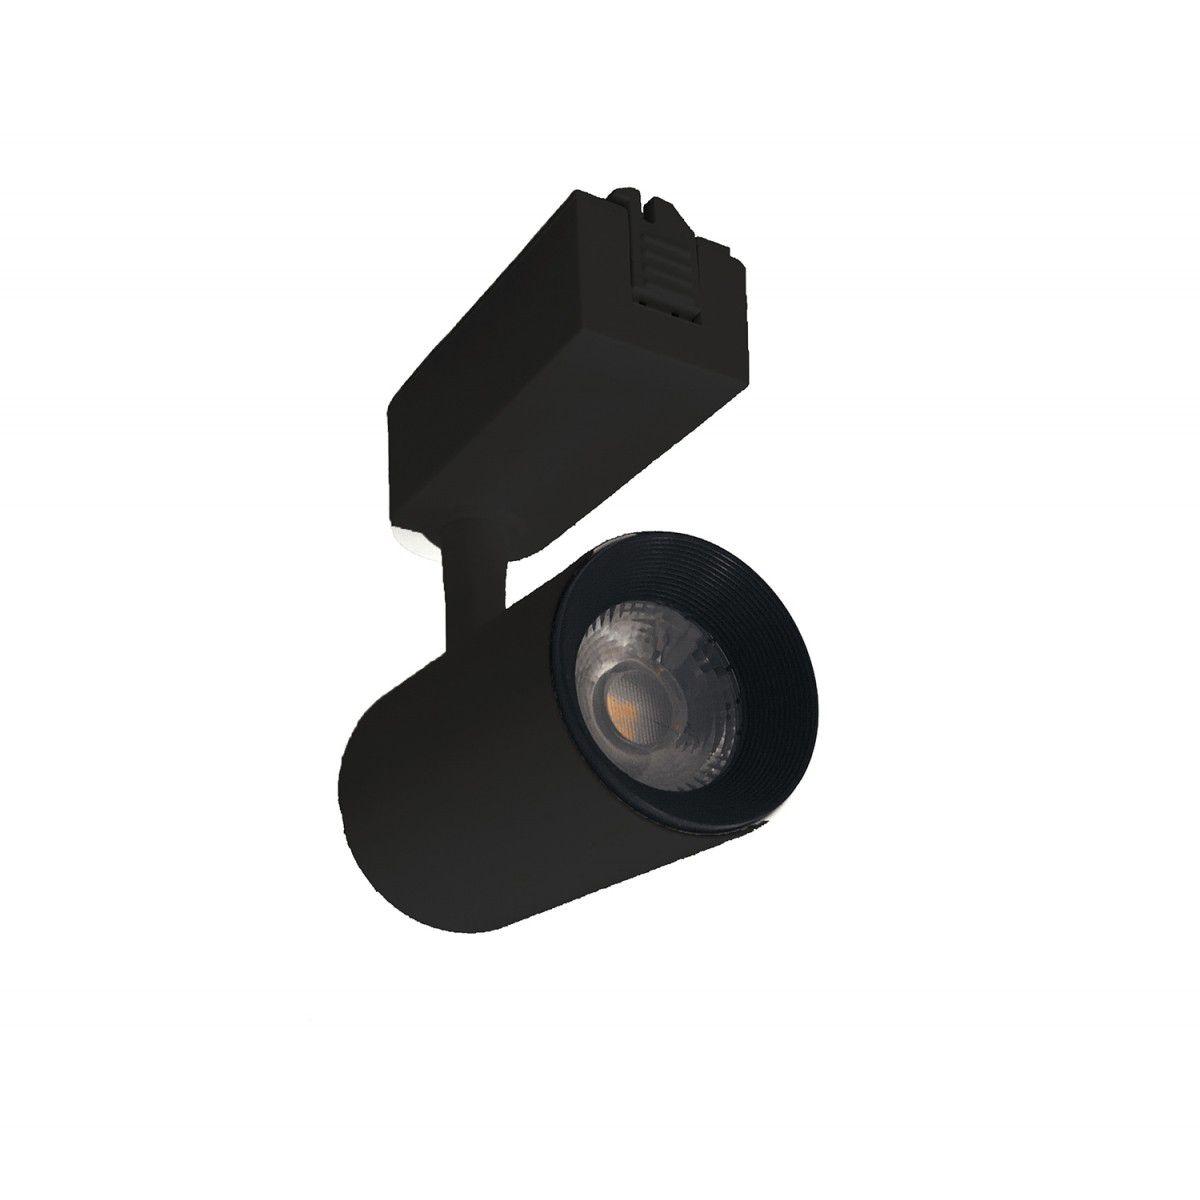 Kit Trilho Eletrificado 1M Preto + 3x Spots LED Preto 7W 3000K